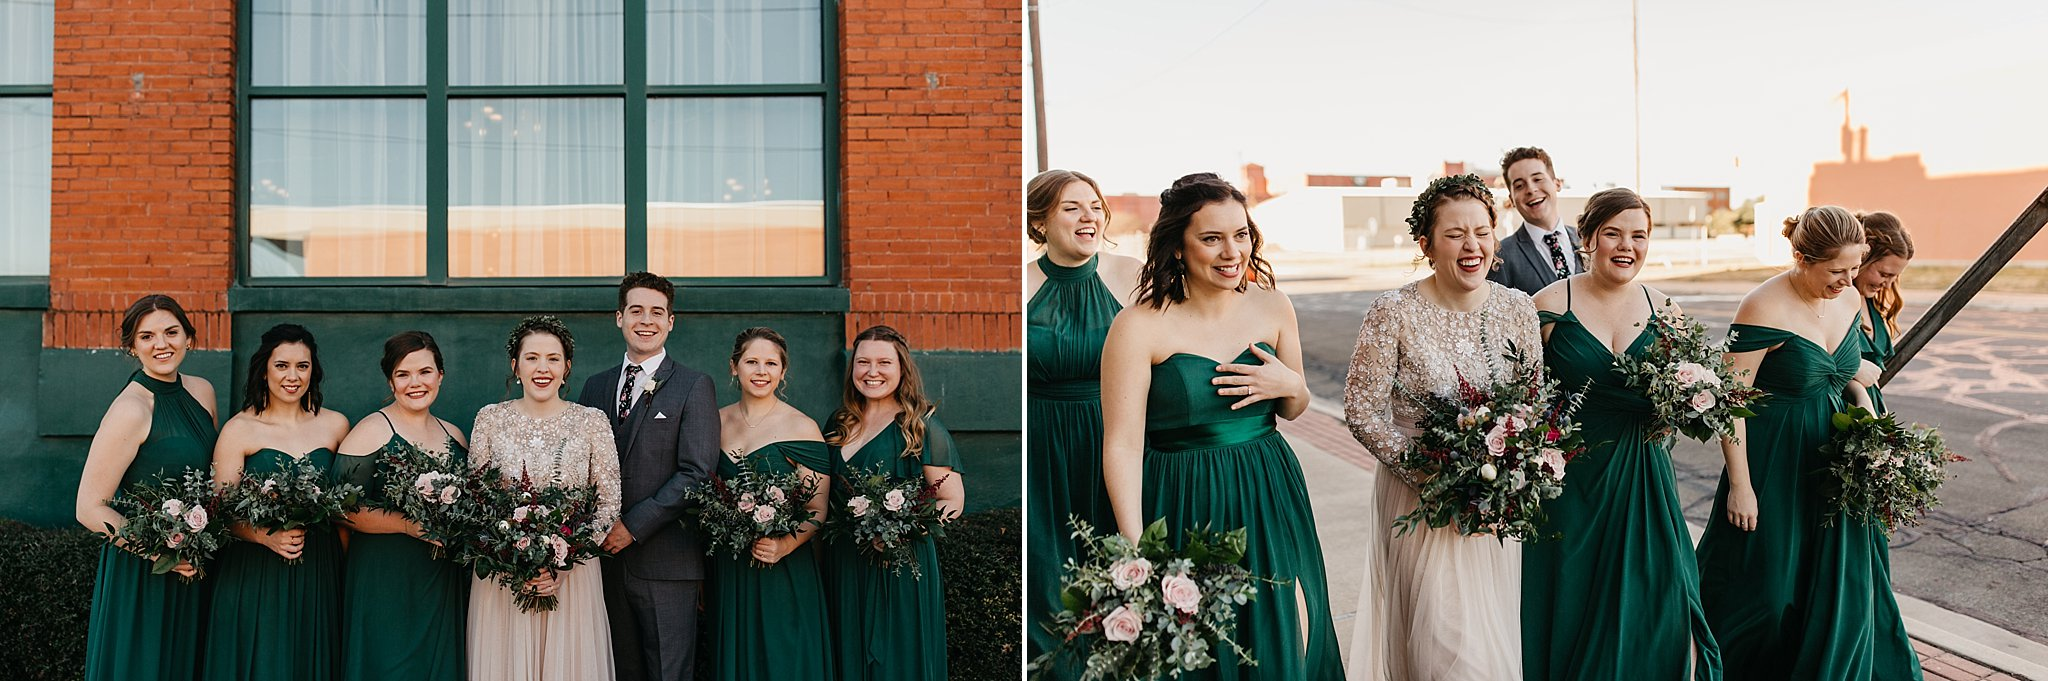 Wilderlove Co_Waco Texas_The Phoenix_Romantic Wedding Photography_0042.jpg